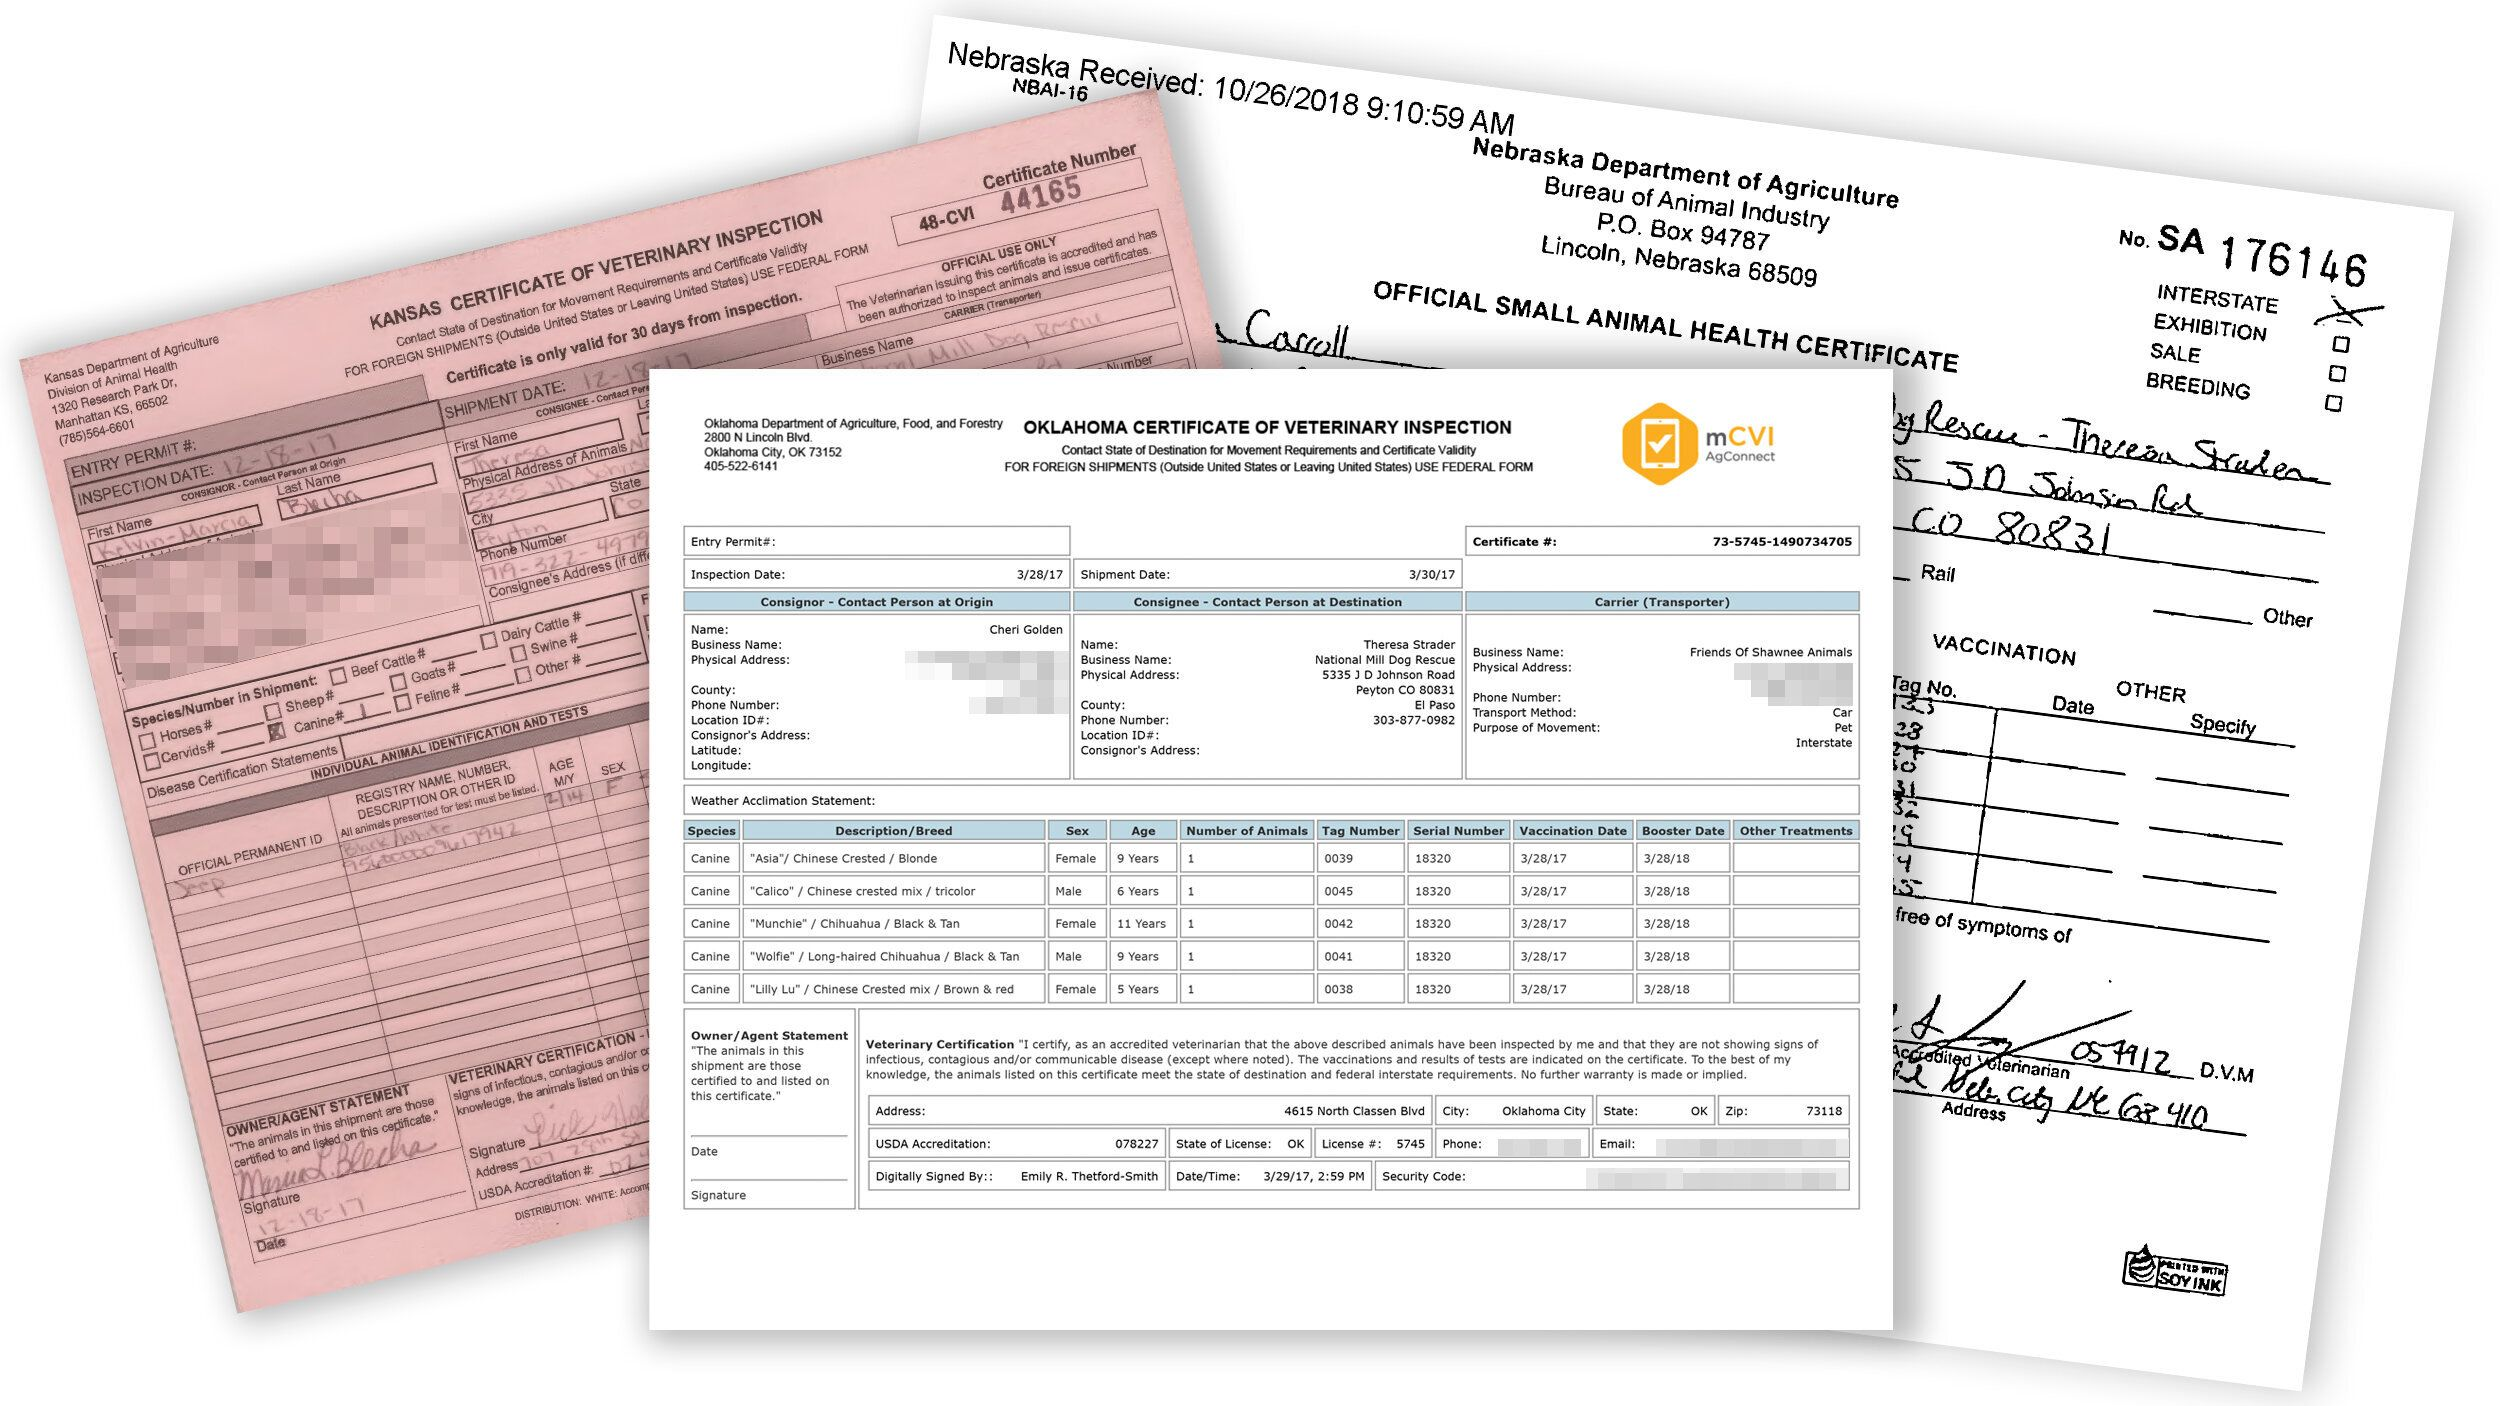 Examples of certificates of veterinary inspection from Kansas, Oklahoma and Nebraska.